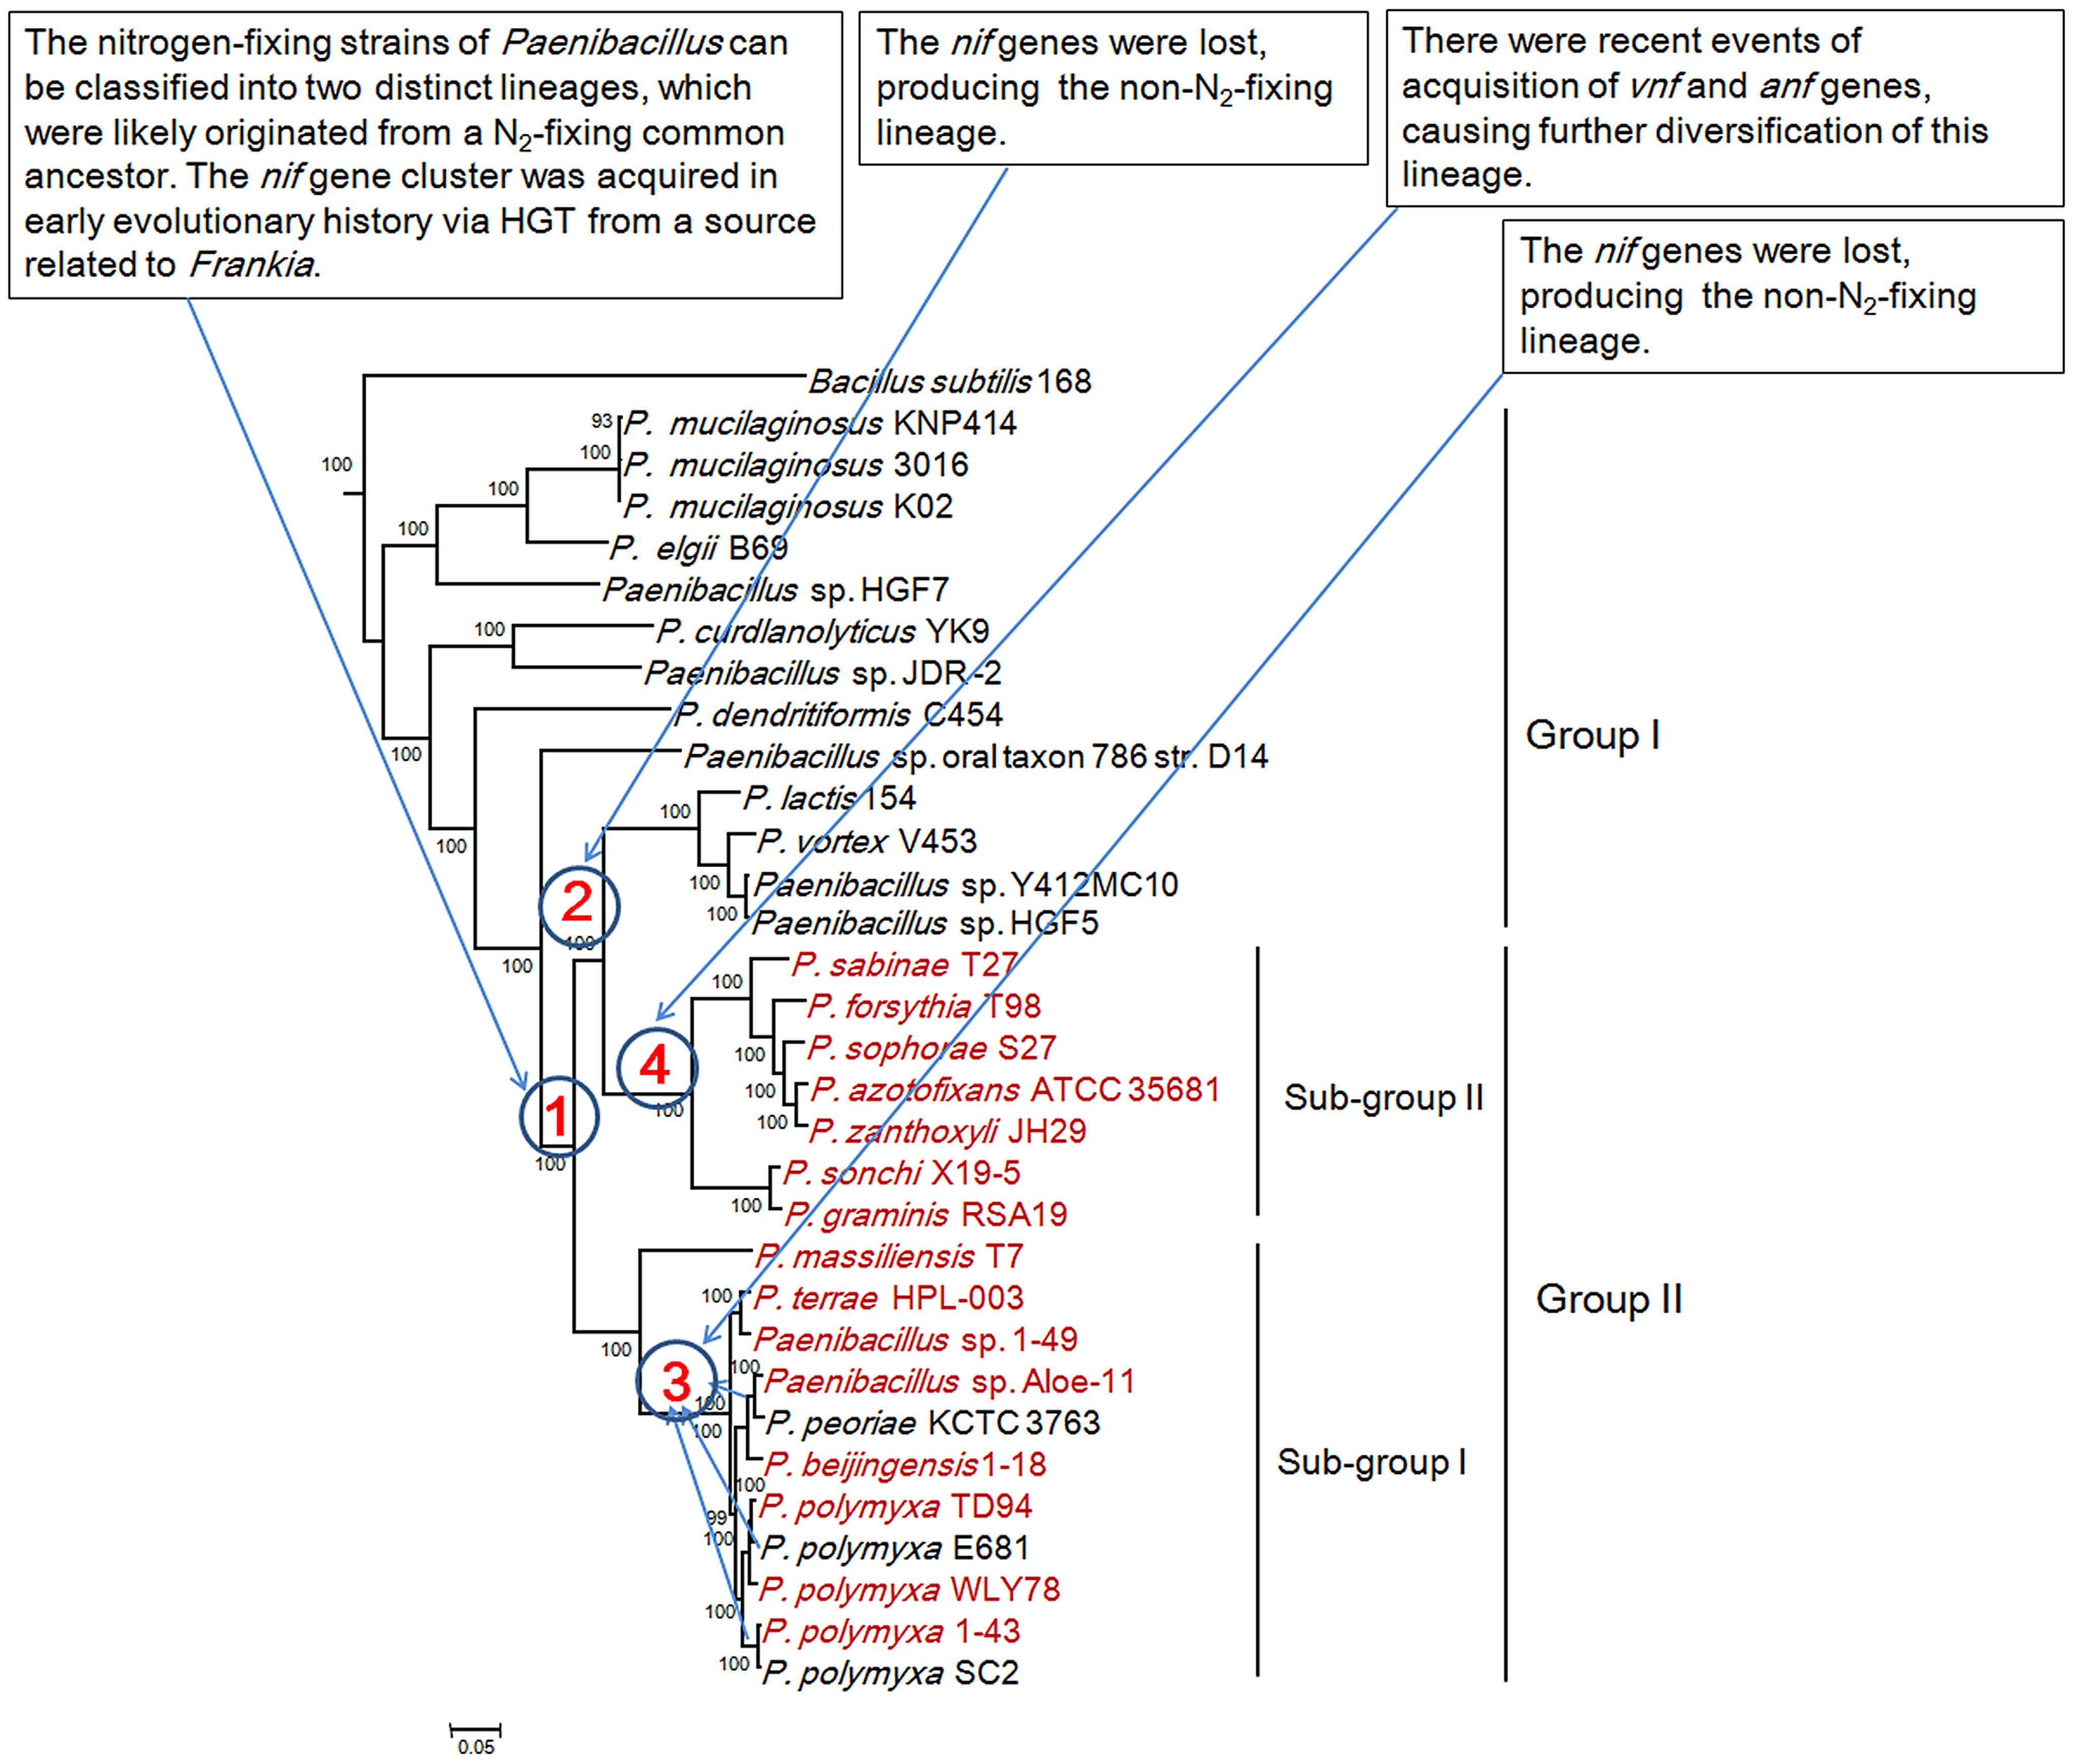 Maximum-likelihood phylogenetic tree of <i>Paenibacillus</i> strains and the 4 possible evolutionary pathways of nitrogen fixation in <i>Paenibacillus</i>.